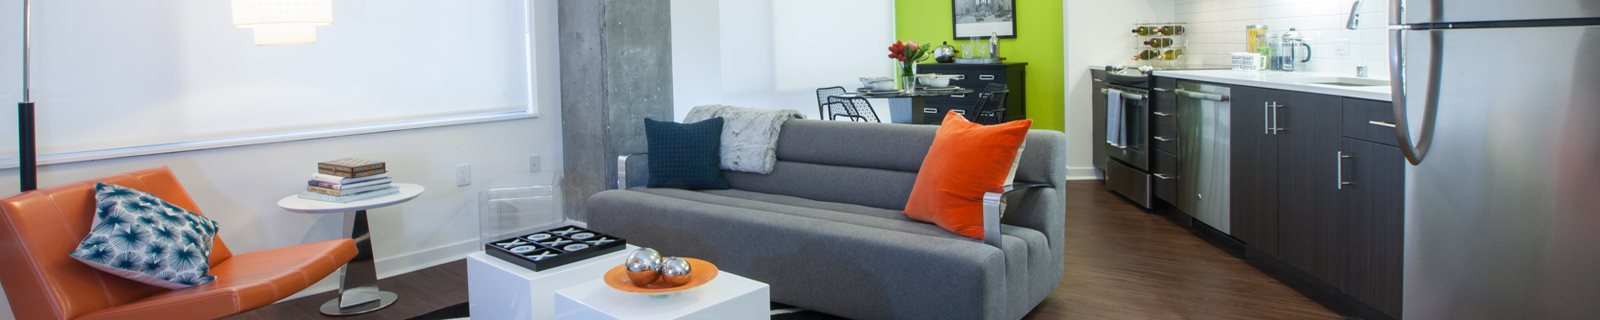 1 2  3bedroom apartments in san francisco ca  venn on